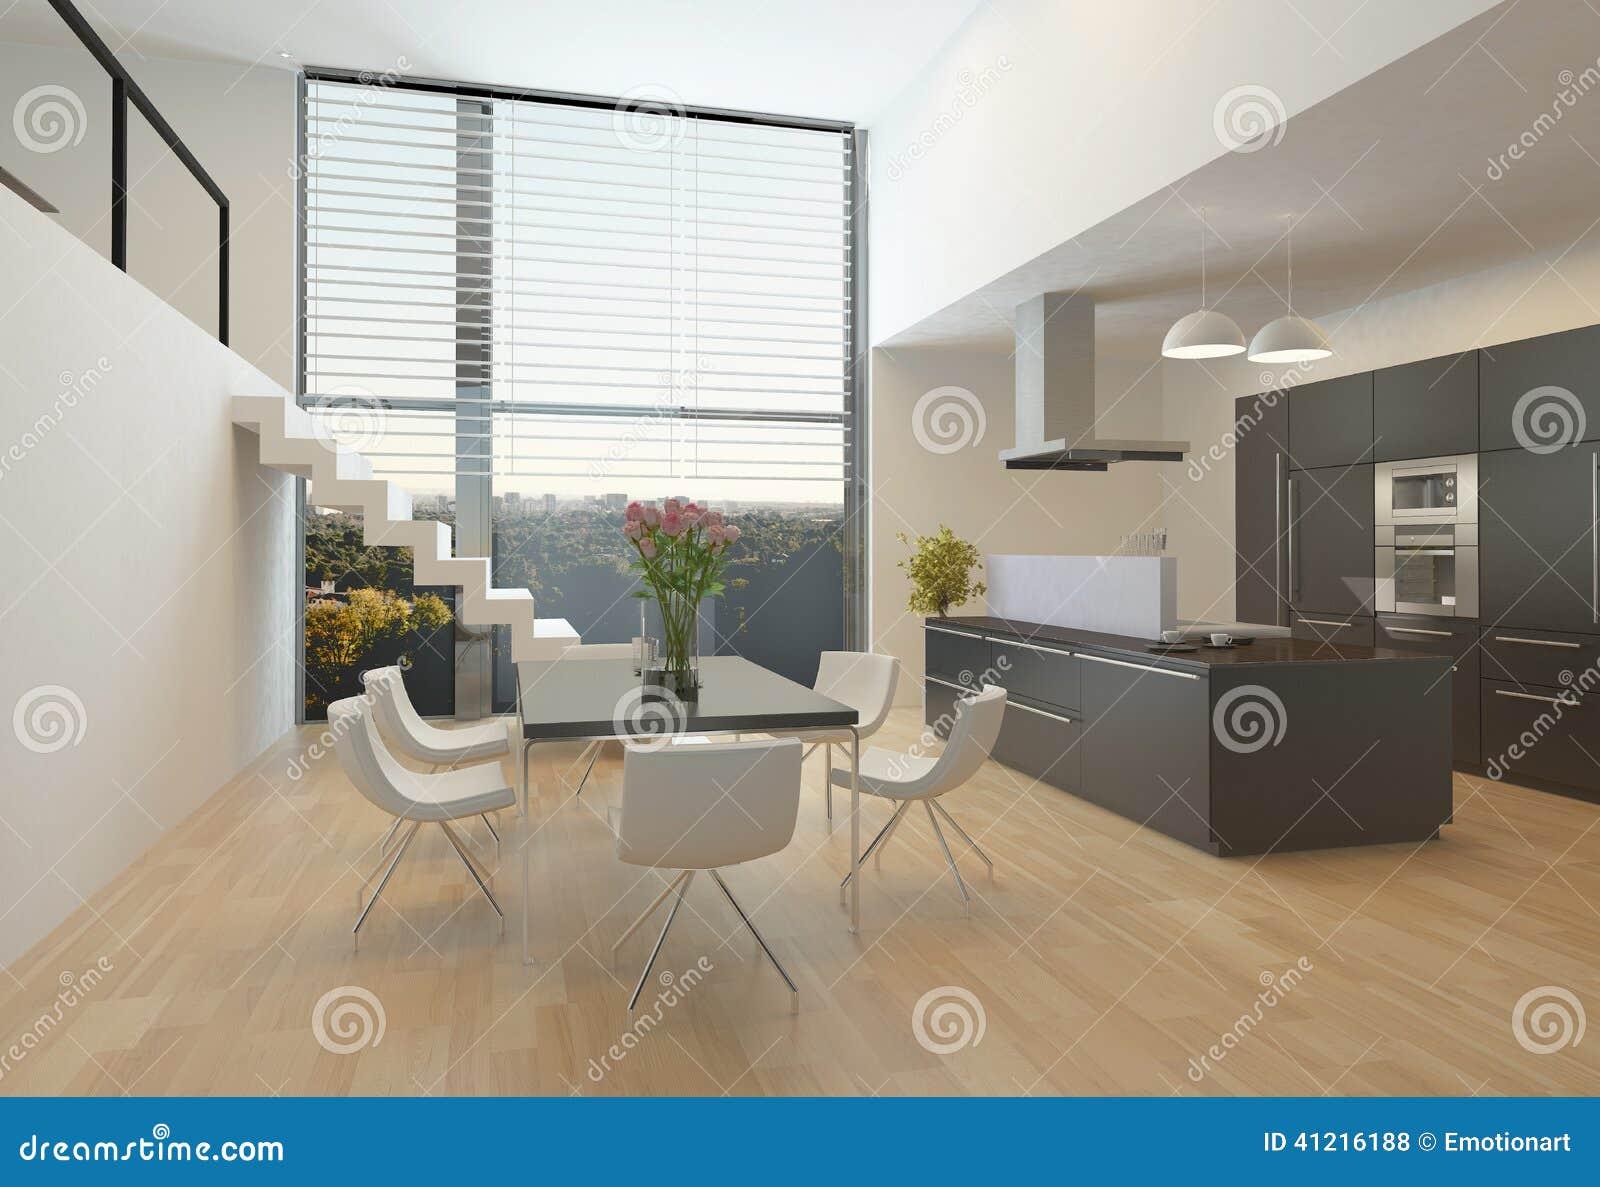 Interieur cuisine moderne 20170824020242 - Interieur cuisine moderne ...